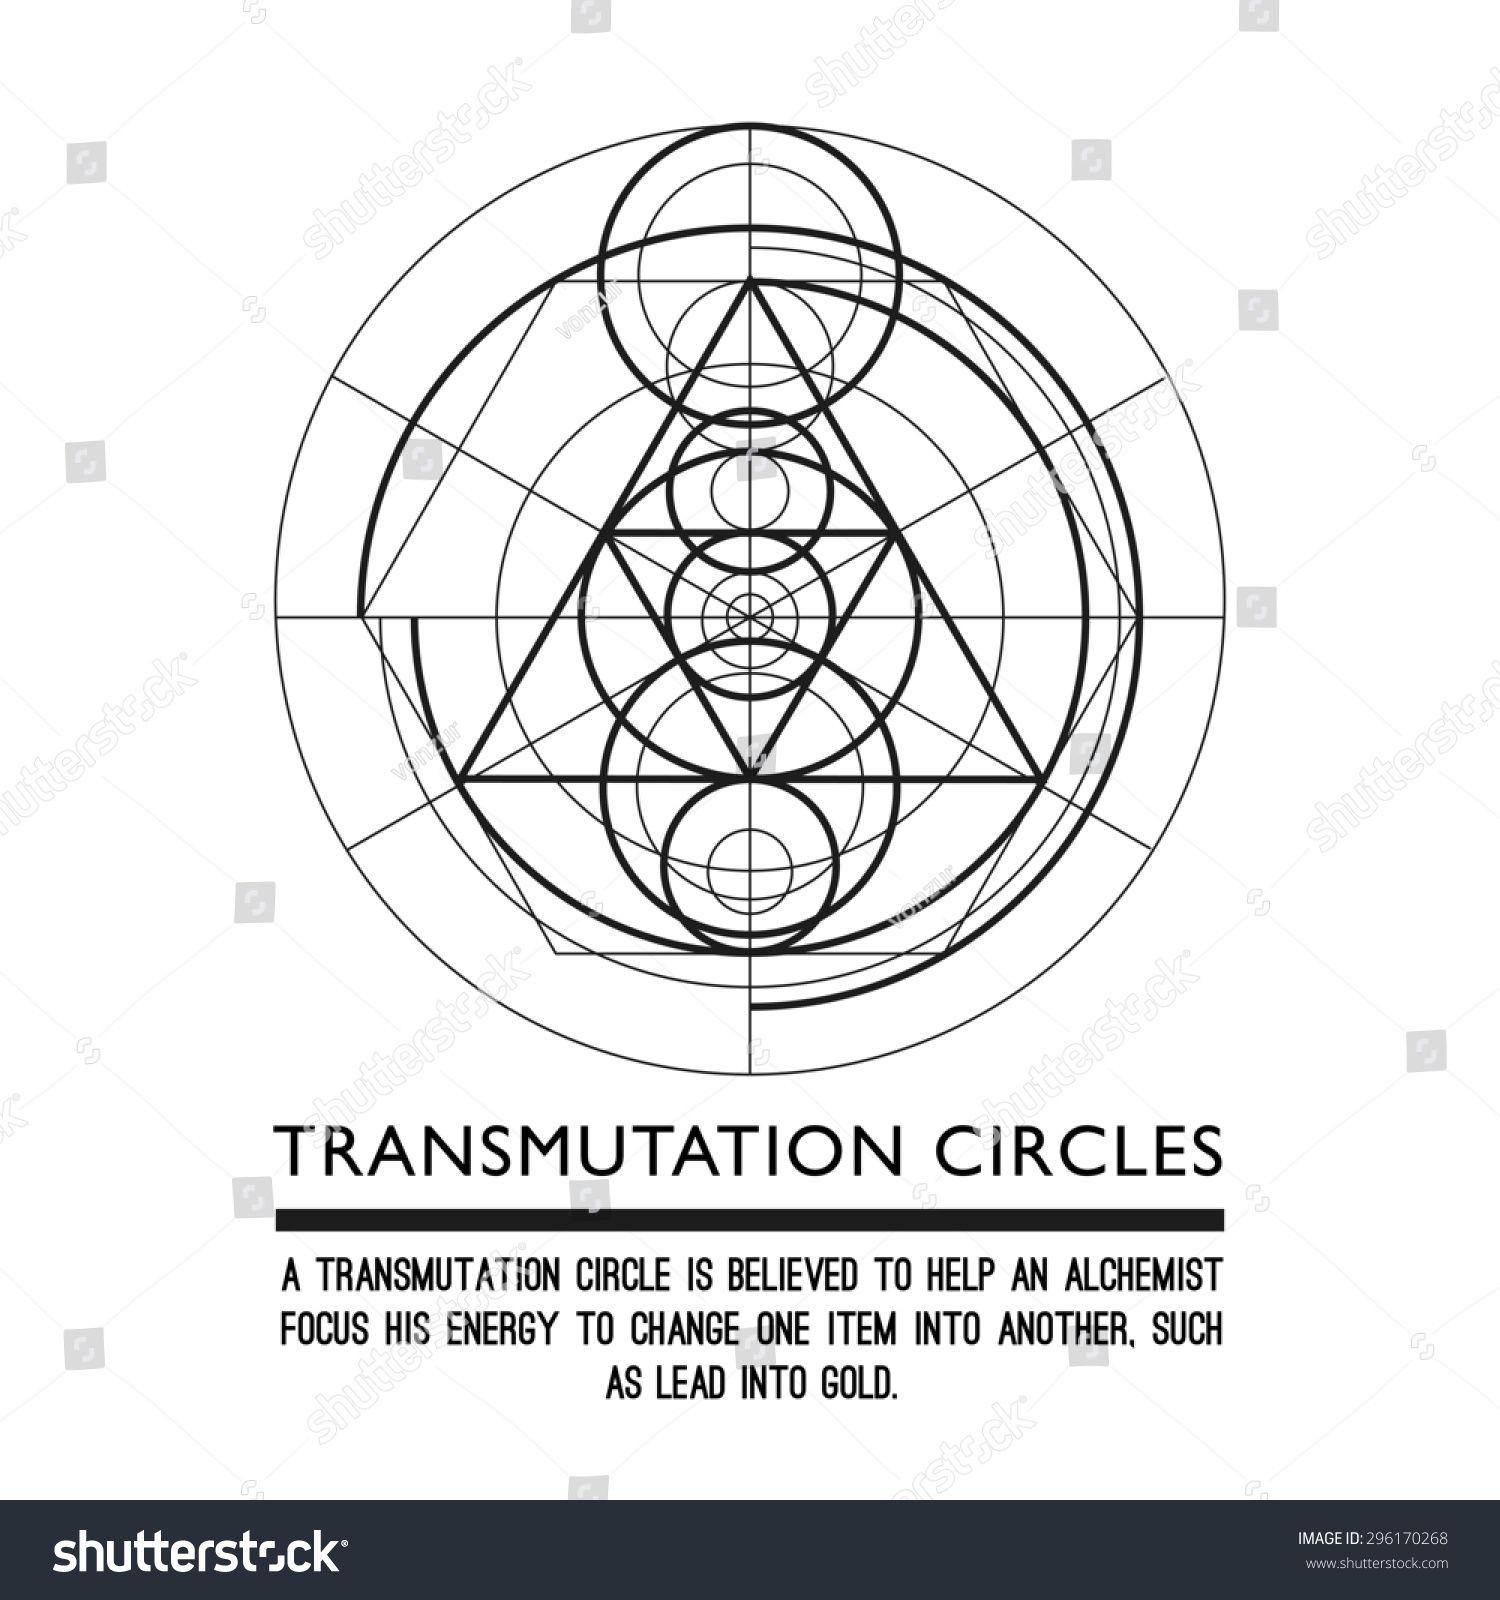 Transmutation Circle Tattoo: Transmutation Circles